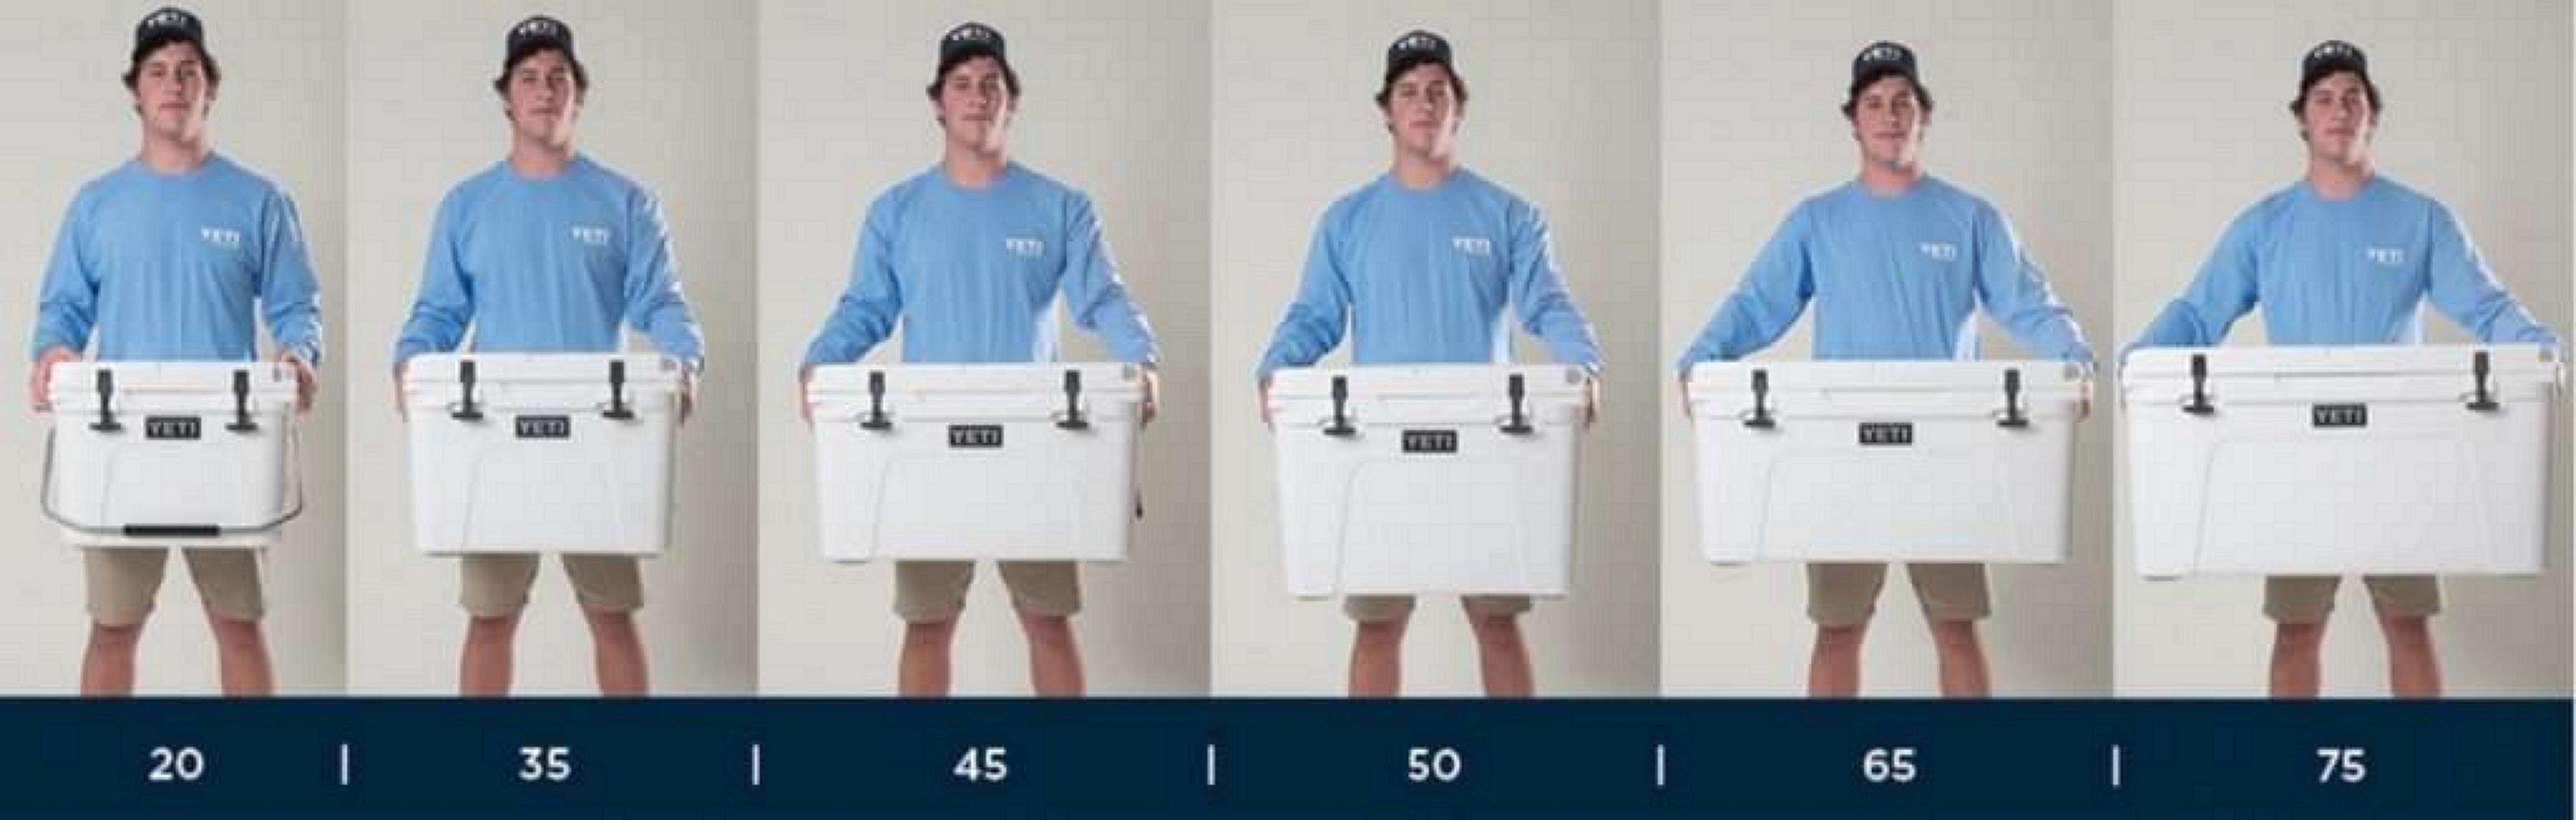 Portable Coolers Capacity Comparison